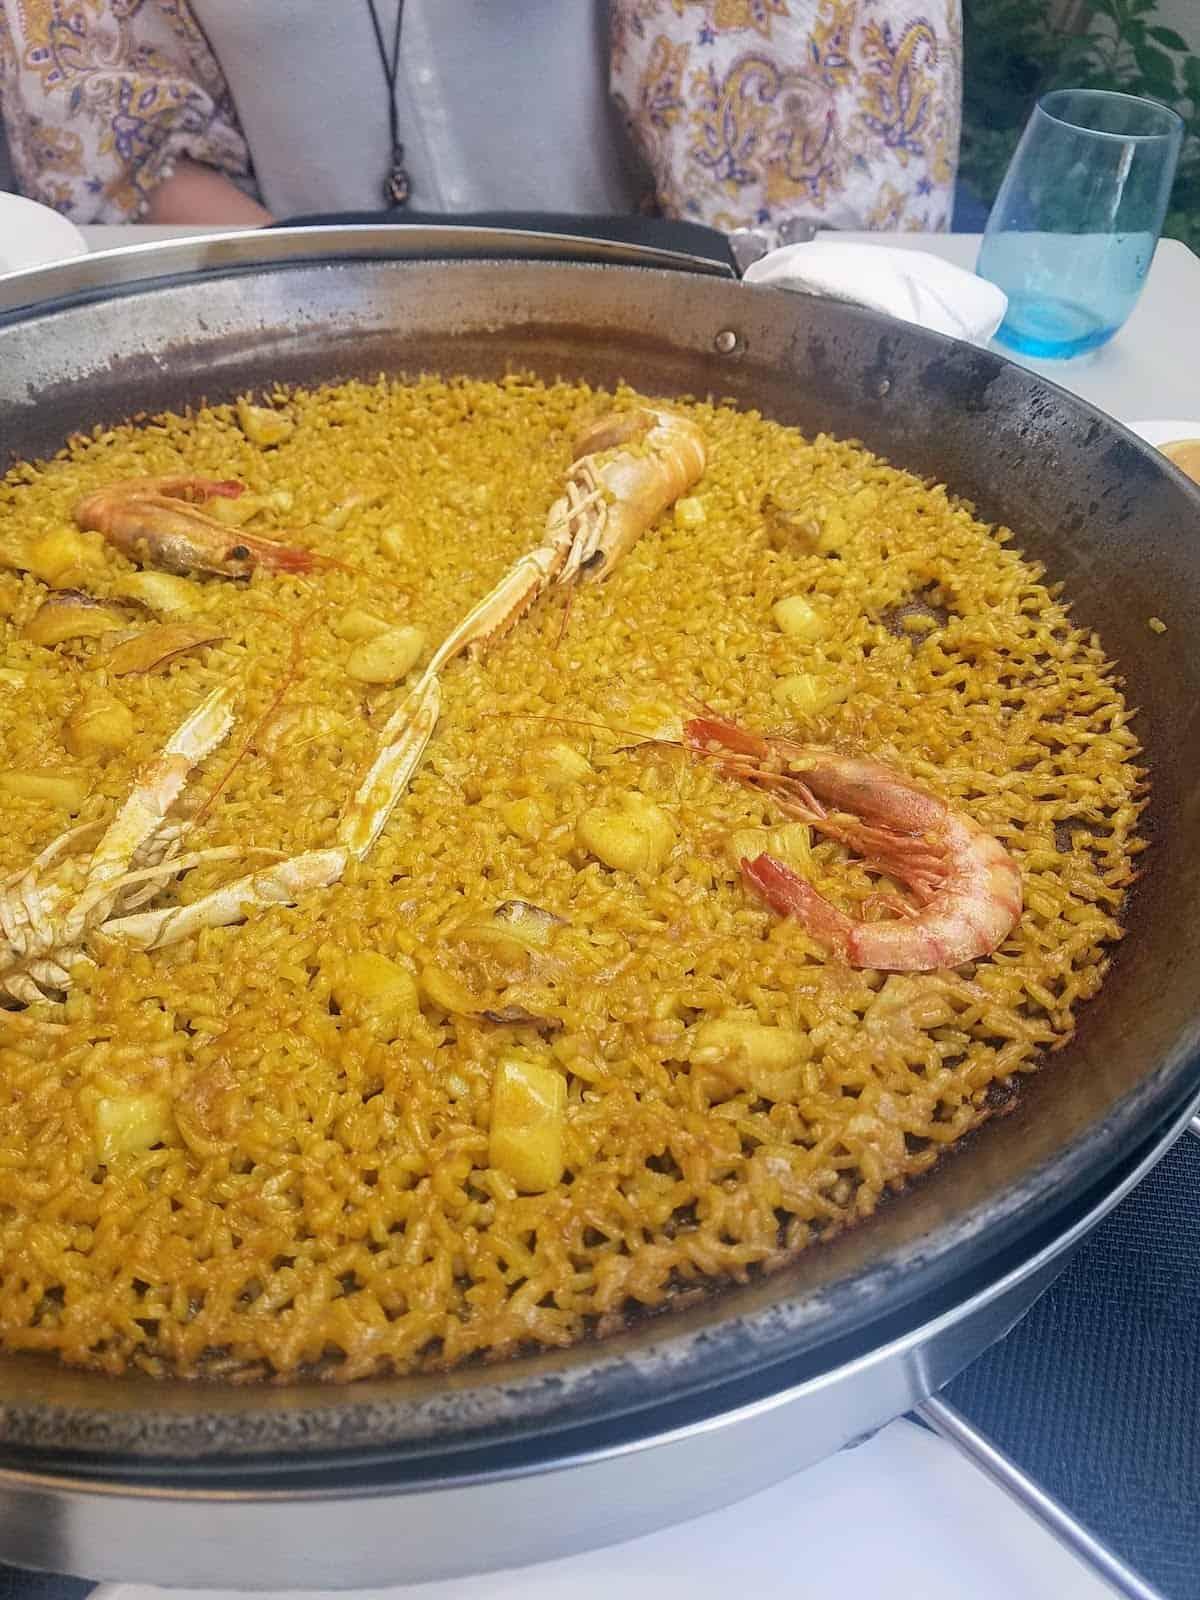 Large metal pan of seafood paella topped with shellfish.